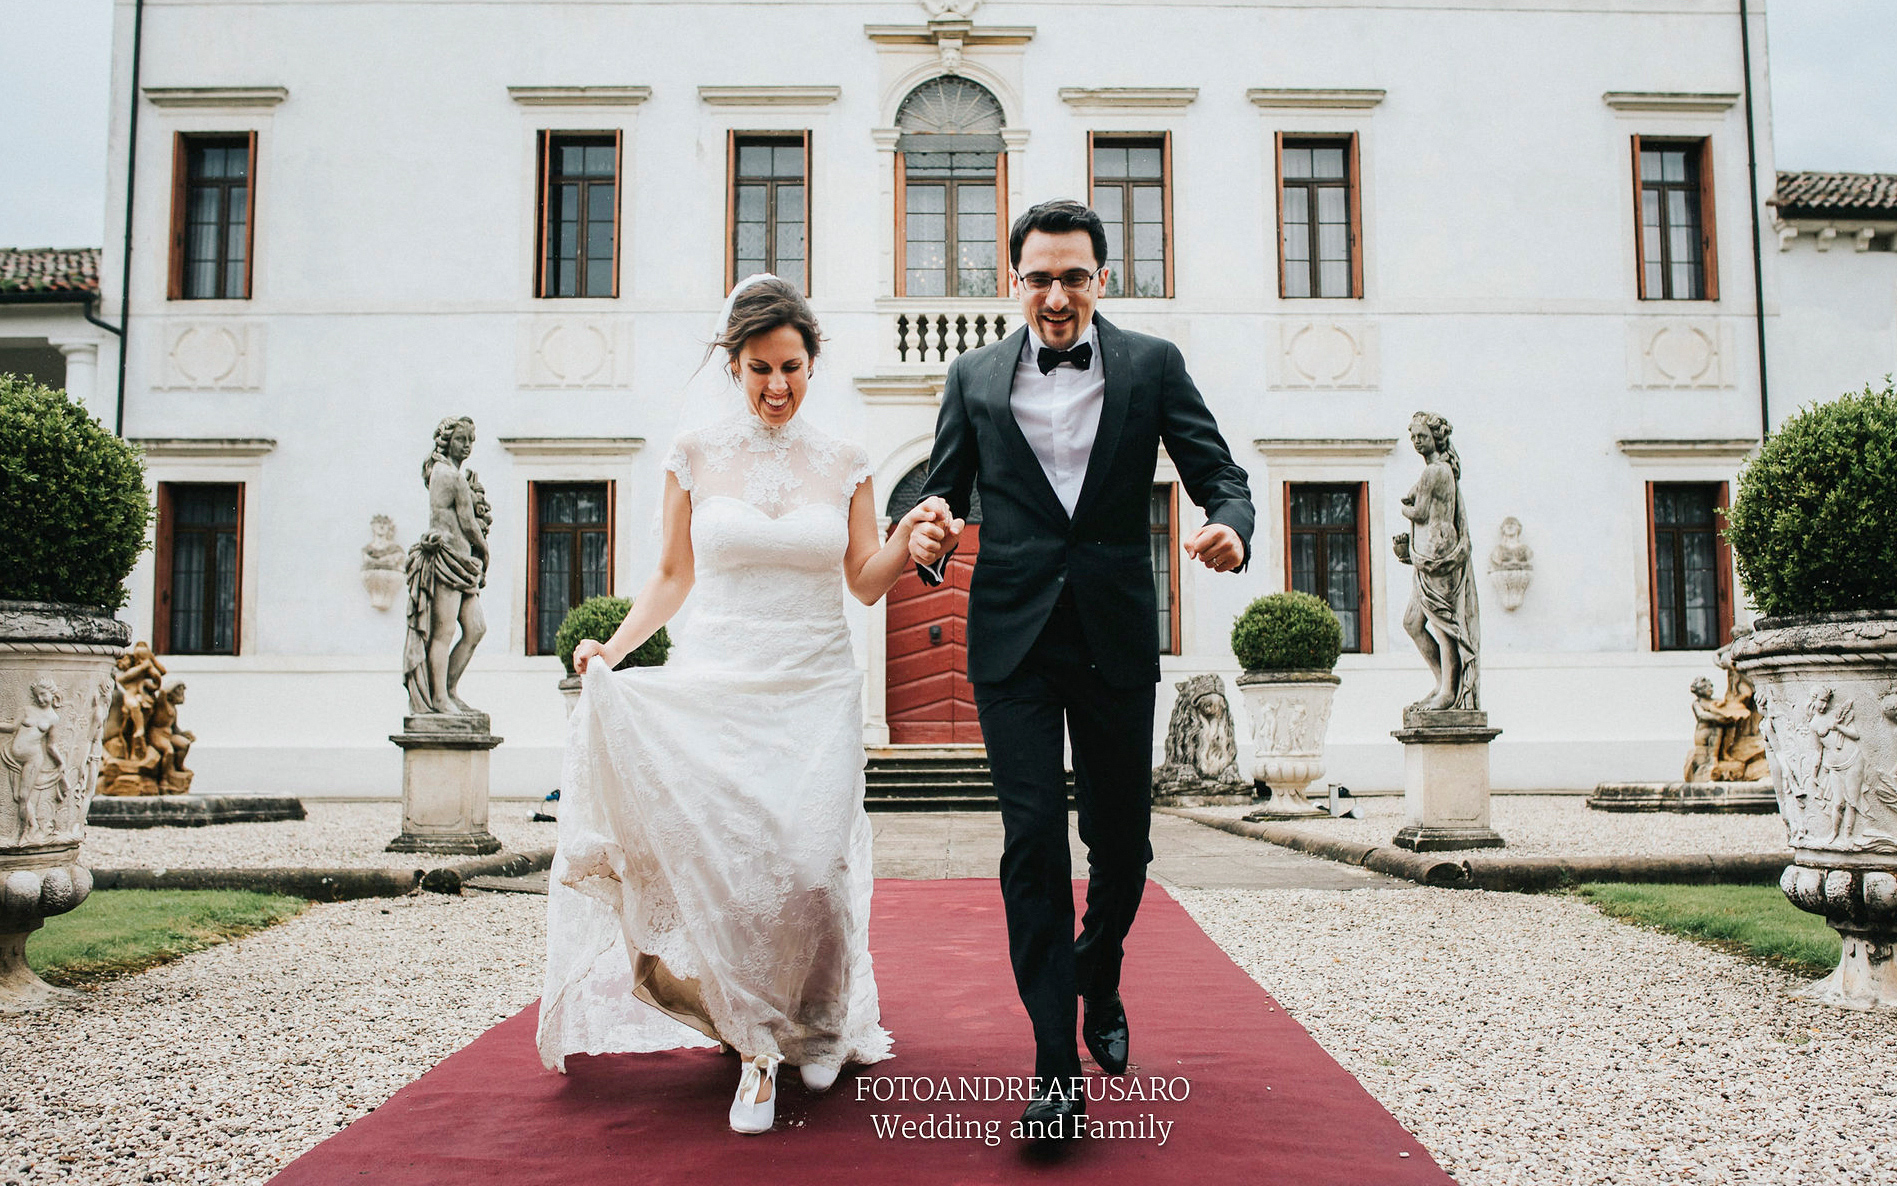 villa per eventi, villa per eventi Vicenza, villa per eventi Padova, villa per matrimoni Vicenza, villa per matrimoni Padova